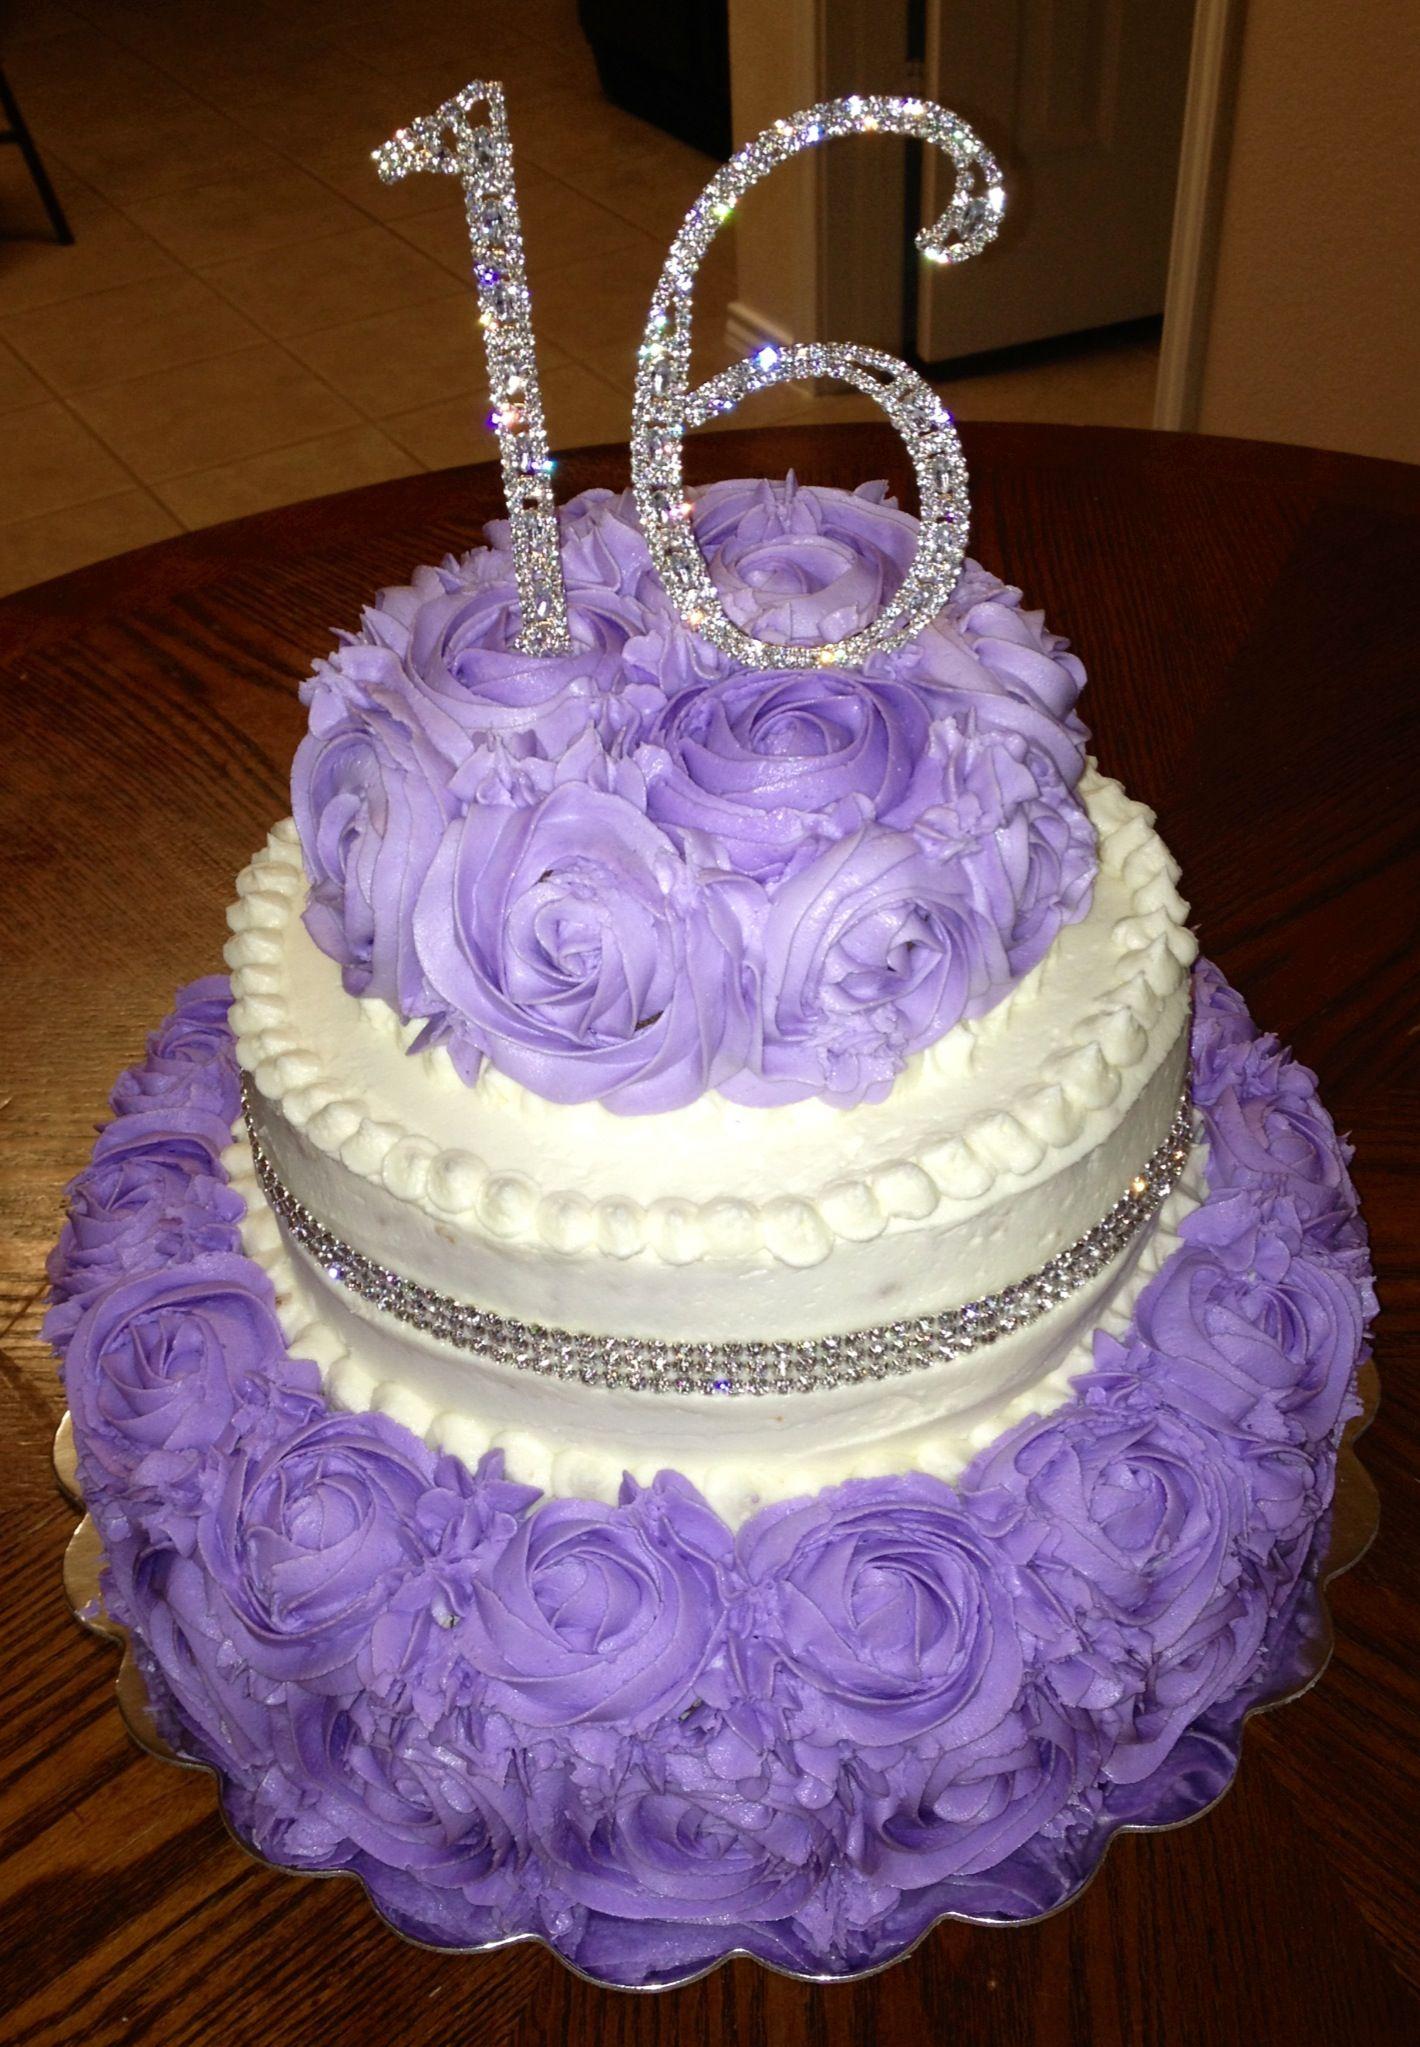 Purple Swirls Sweet 16 Cake With Images Sweet 16 Birthday Cake